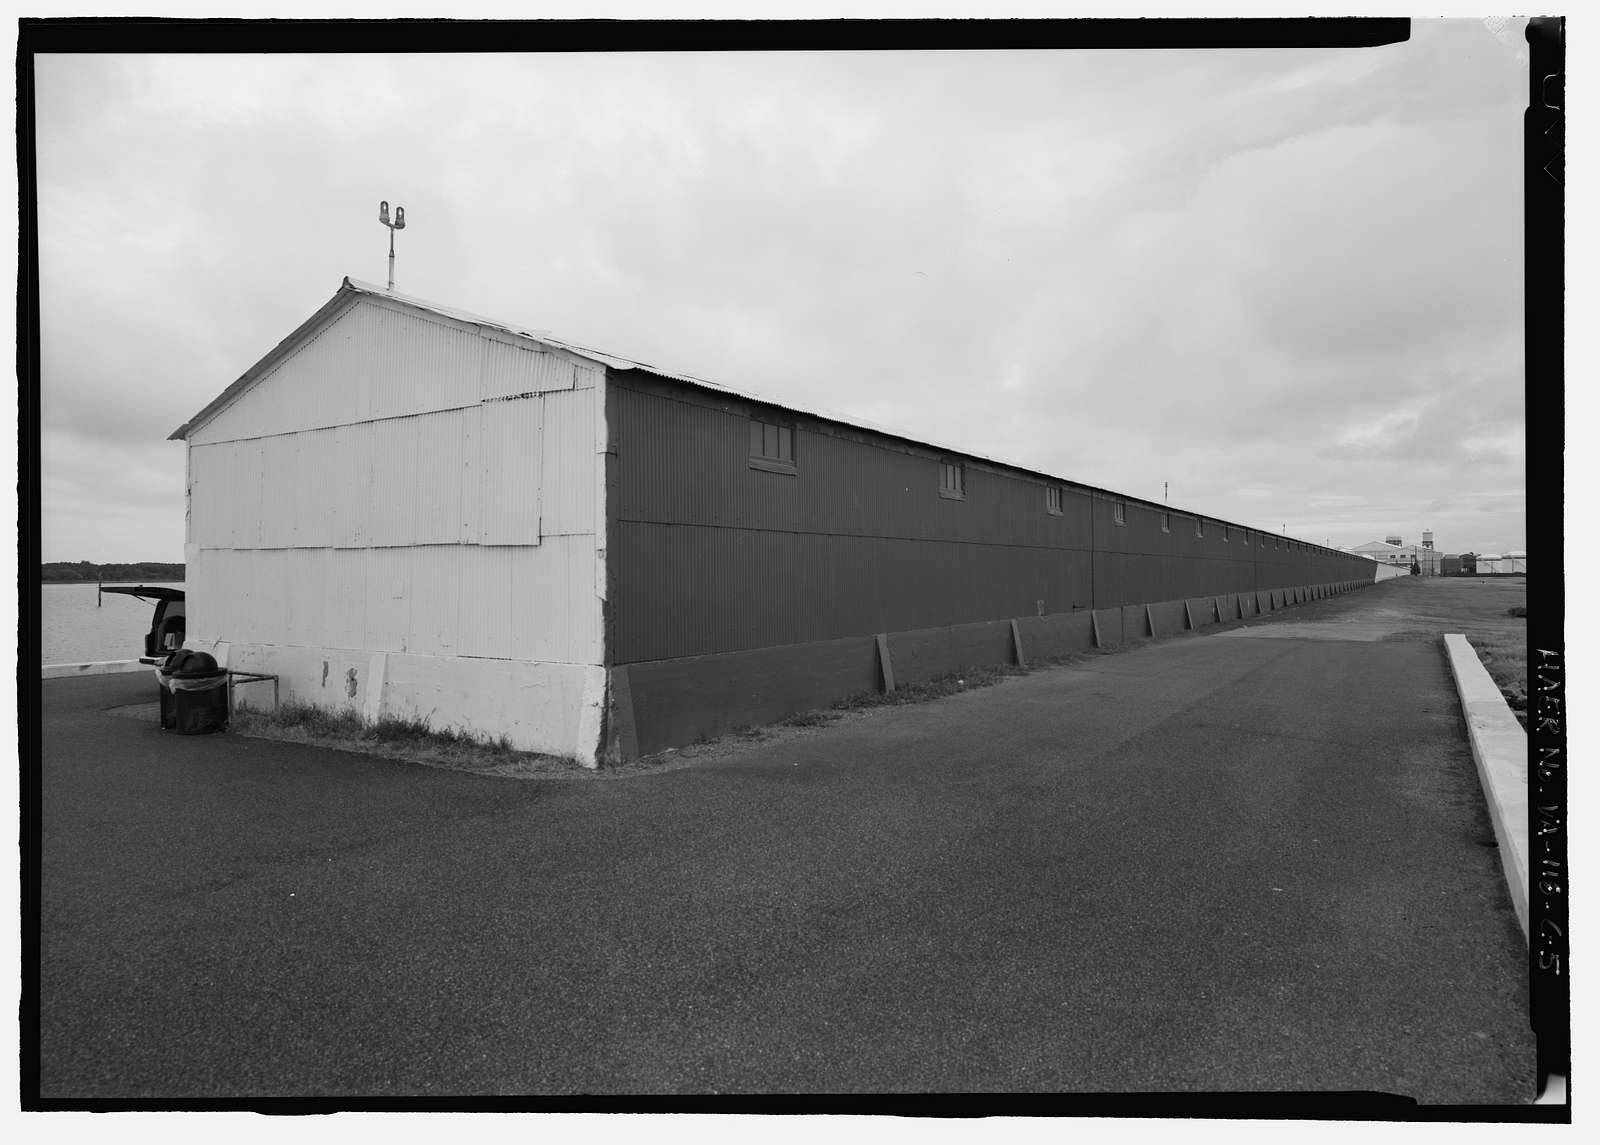 NASA Langley Research Center, Seaplane Towing Channel, 108 Andrews Street, Hampton, Hampton, VA